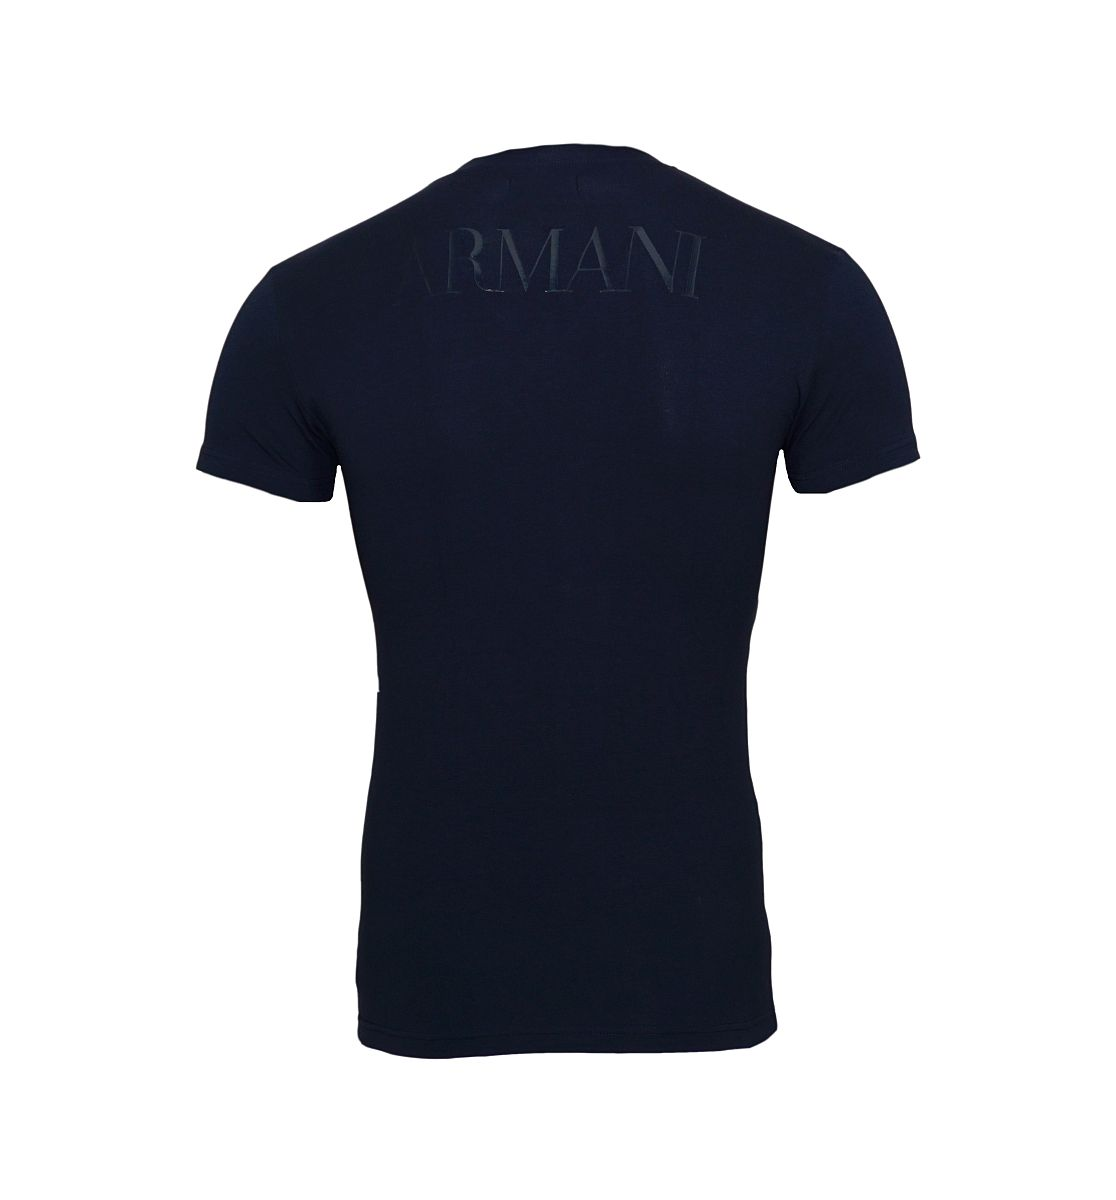 Emporio Armani T-Shirts V-Ausschnitt 110810 8P516 00135 MARINE W18-EATS1